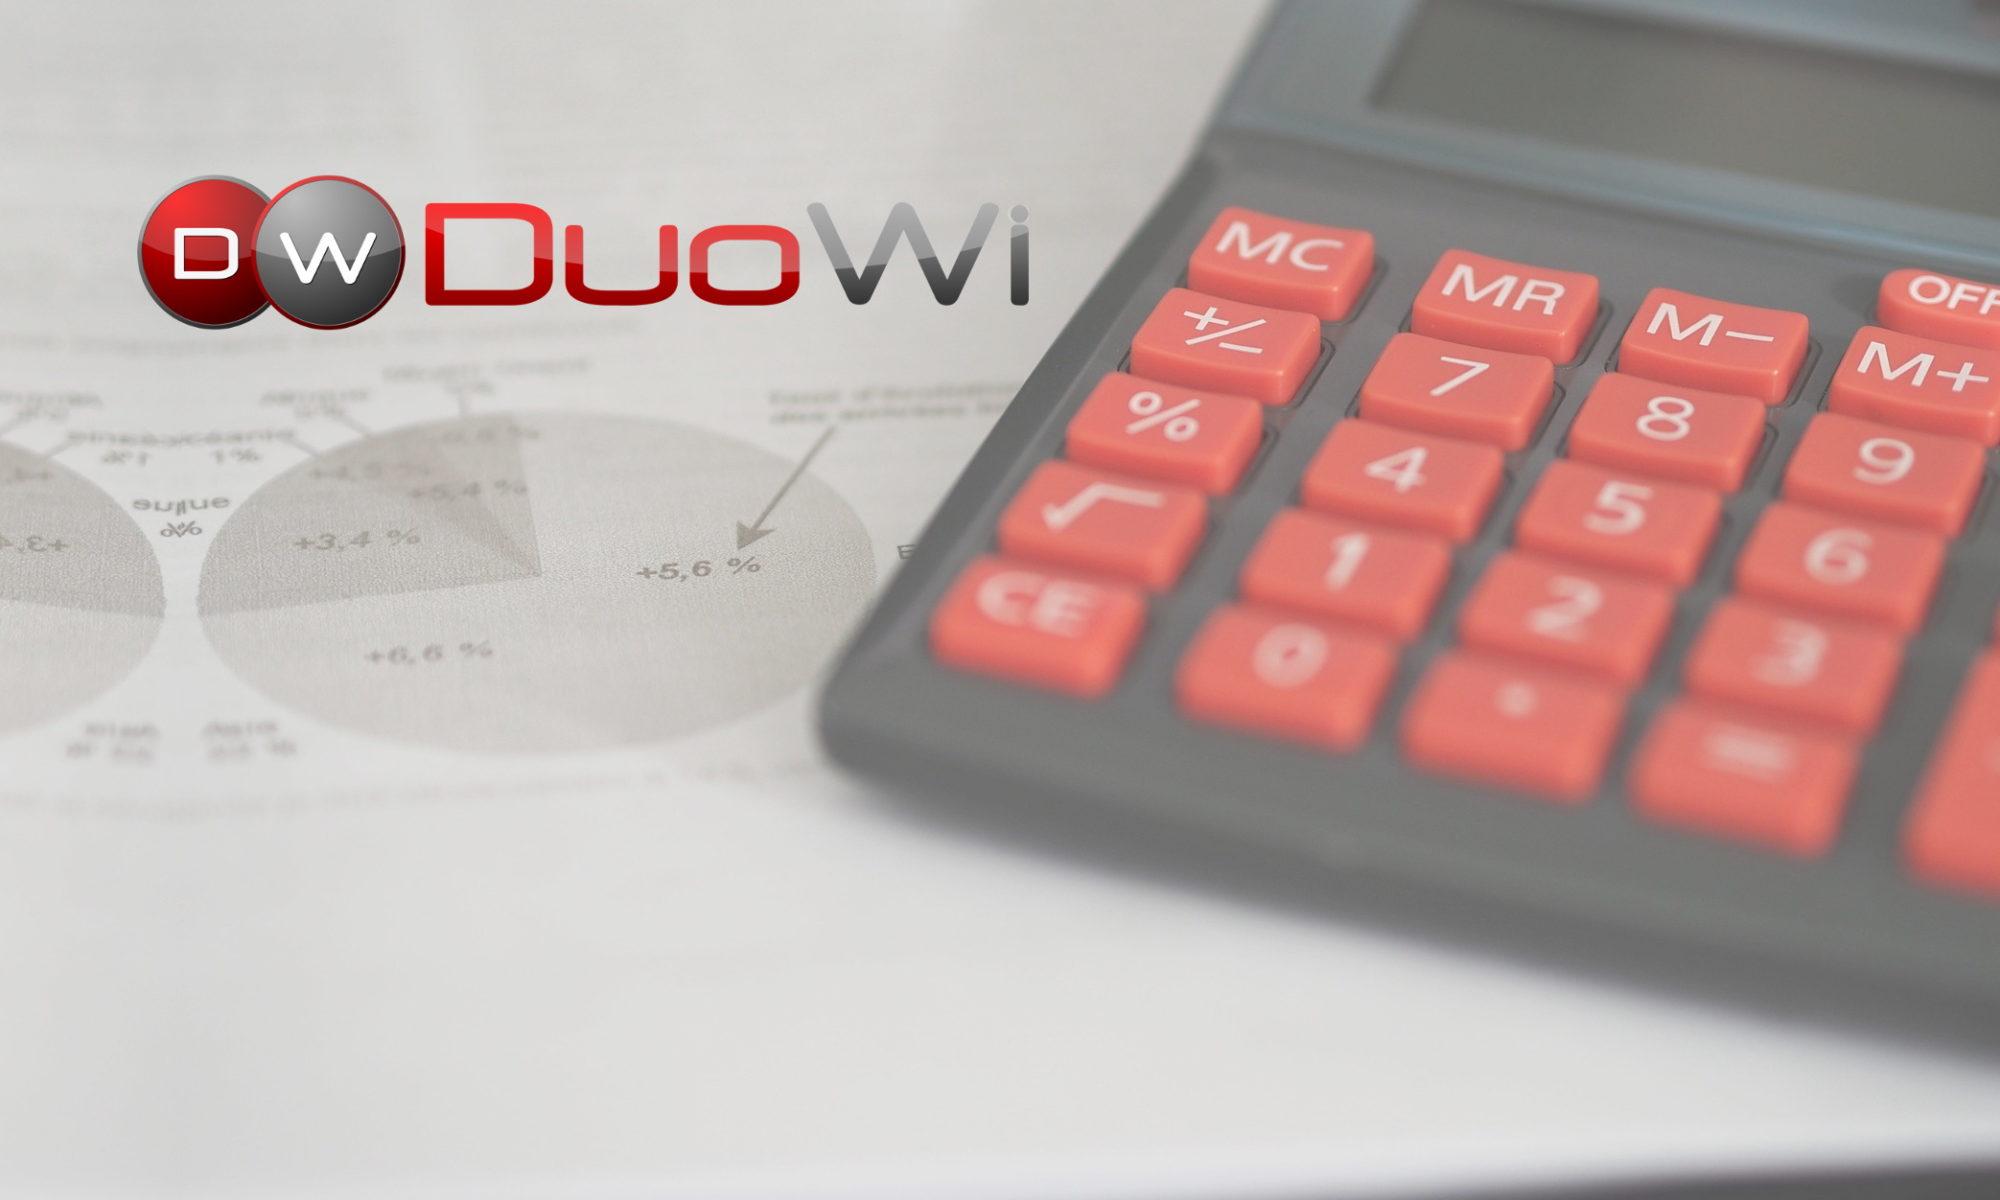 Biuro Rachunkowe Duowi